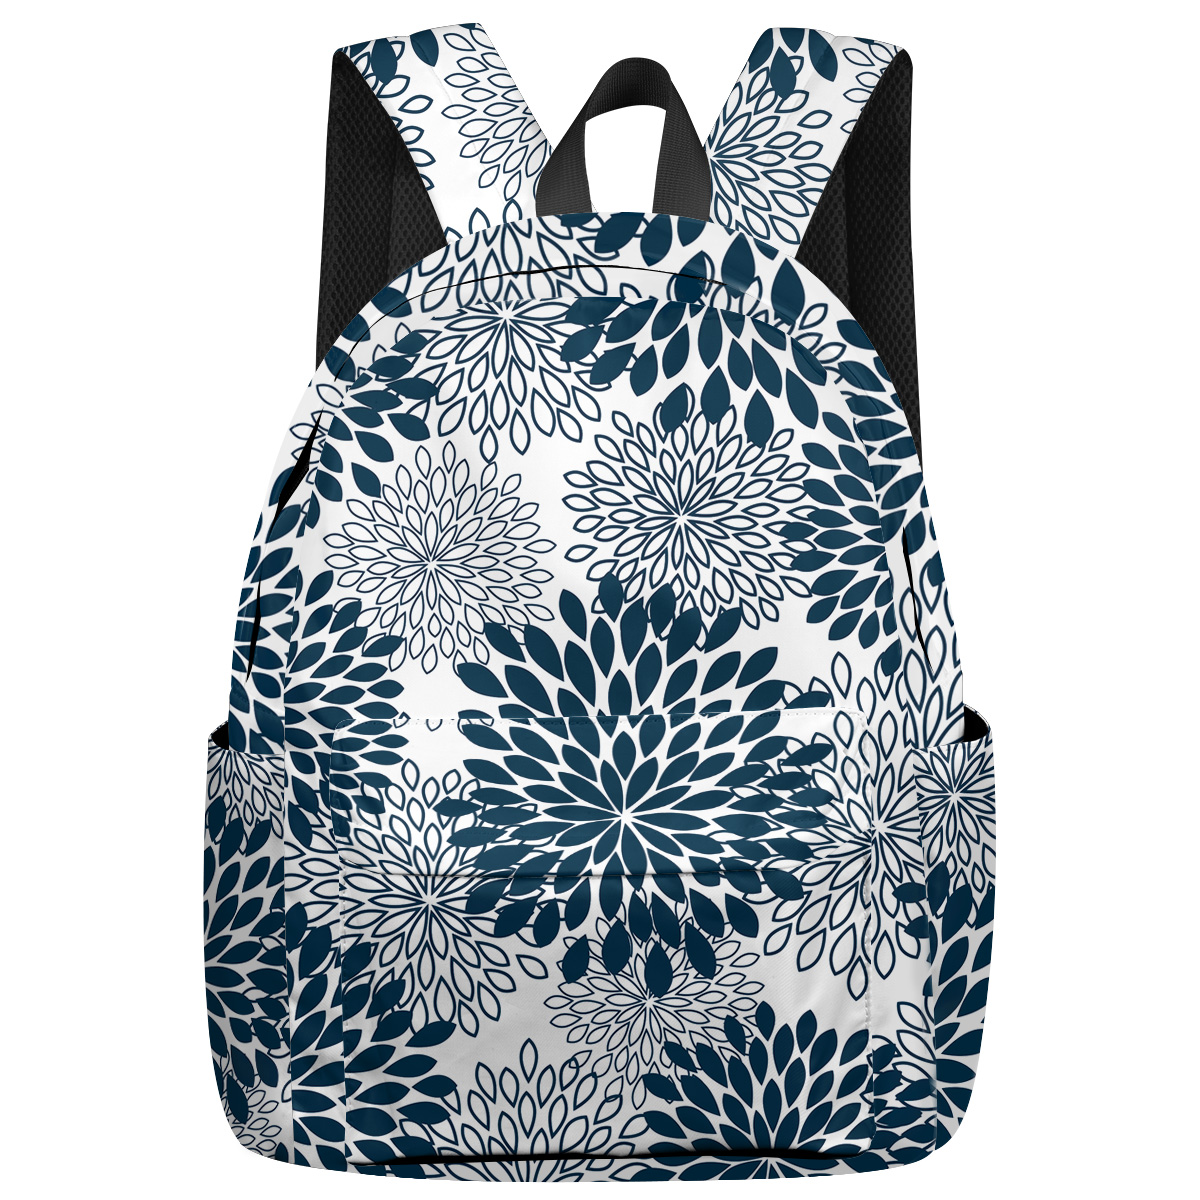 Japanese Abstract Flower Laptop Backpacks Business Daypack Water Resistant Sports Backpack Weekend Travel Knapsack Bag